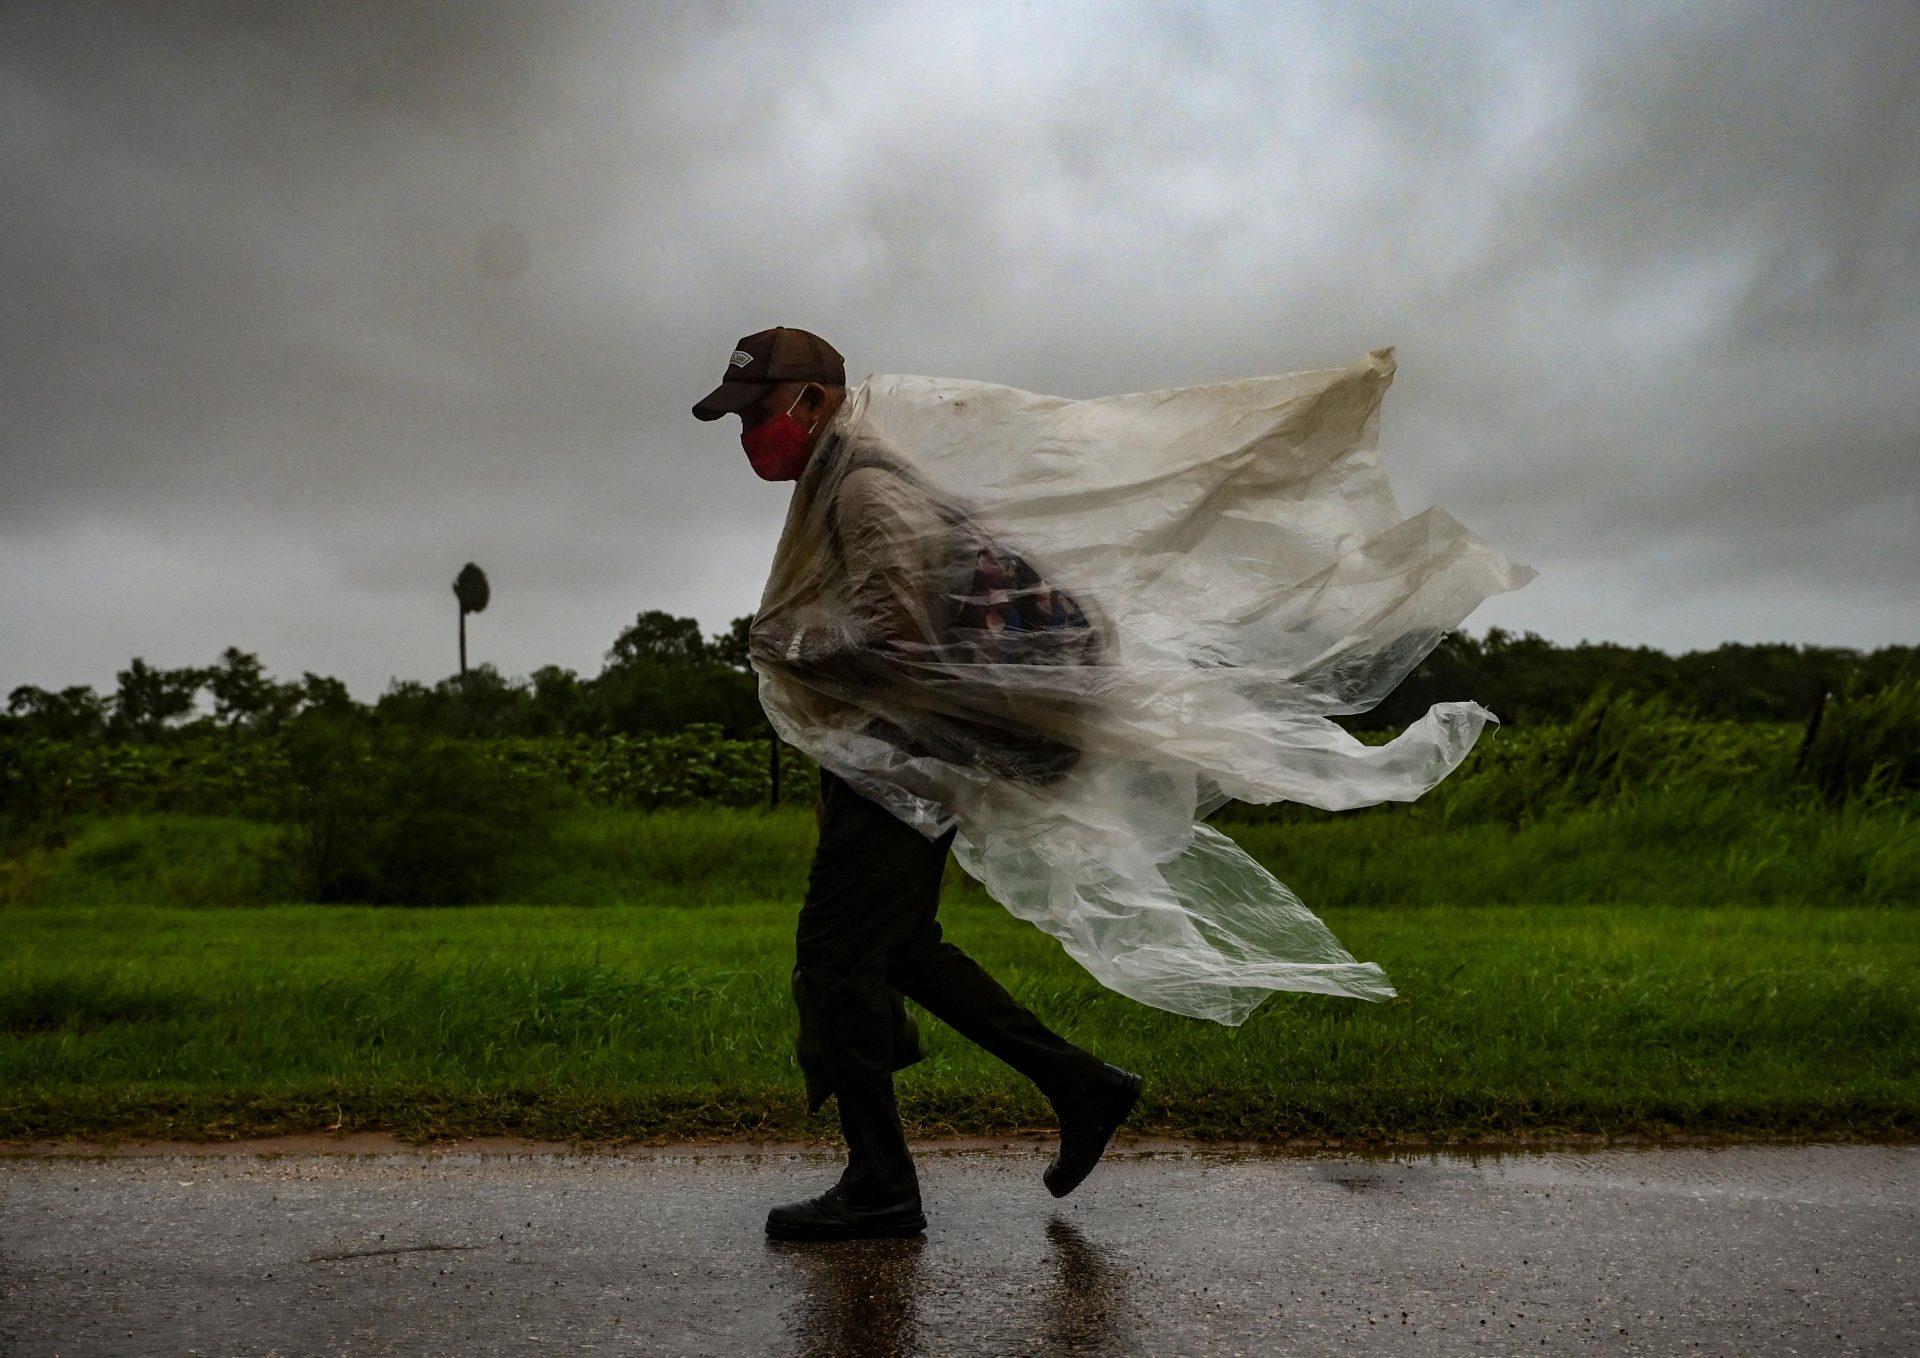 A man walks through the rain in Batabano, Mayabeque province as Hurricane Ida passes through eastern Cuba. Photo: Getty Images.